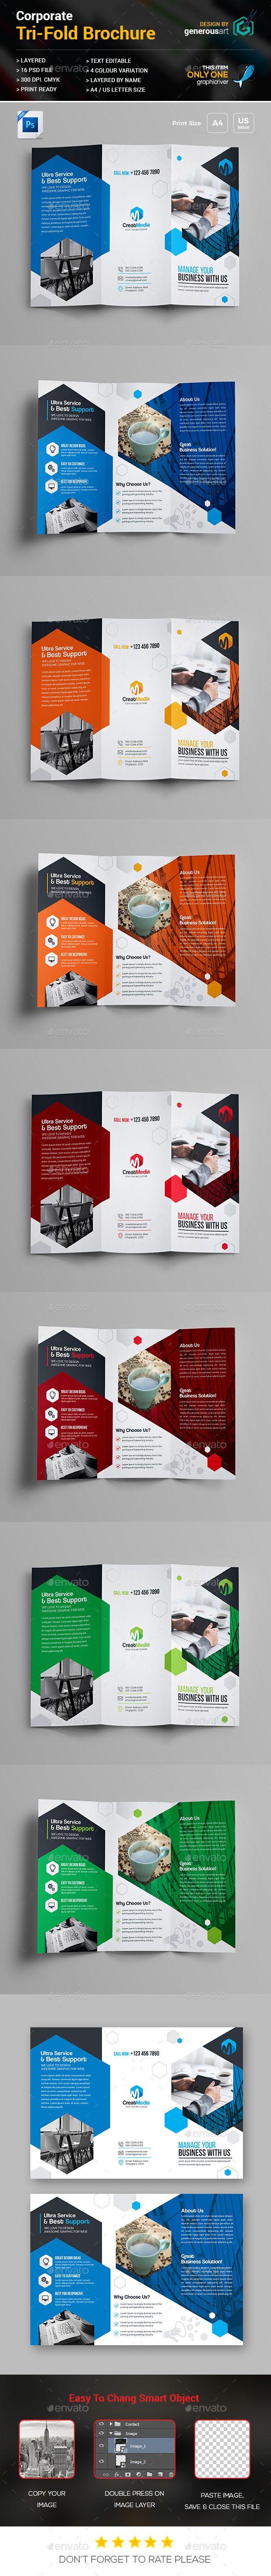 Business TriFold Brochure Template PSD